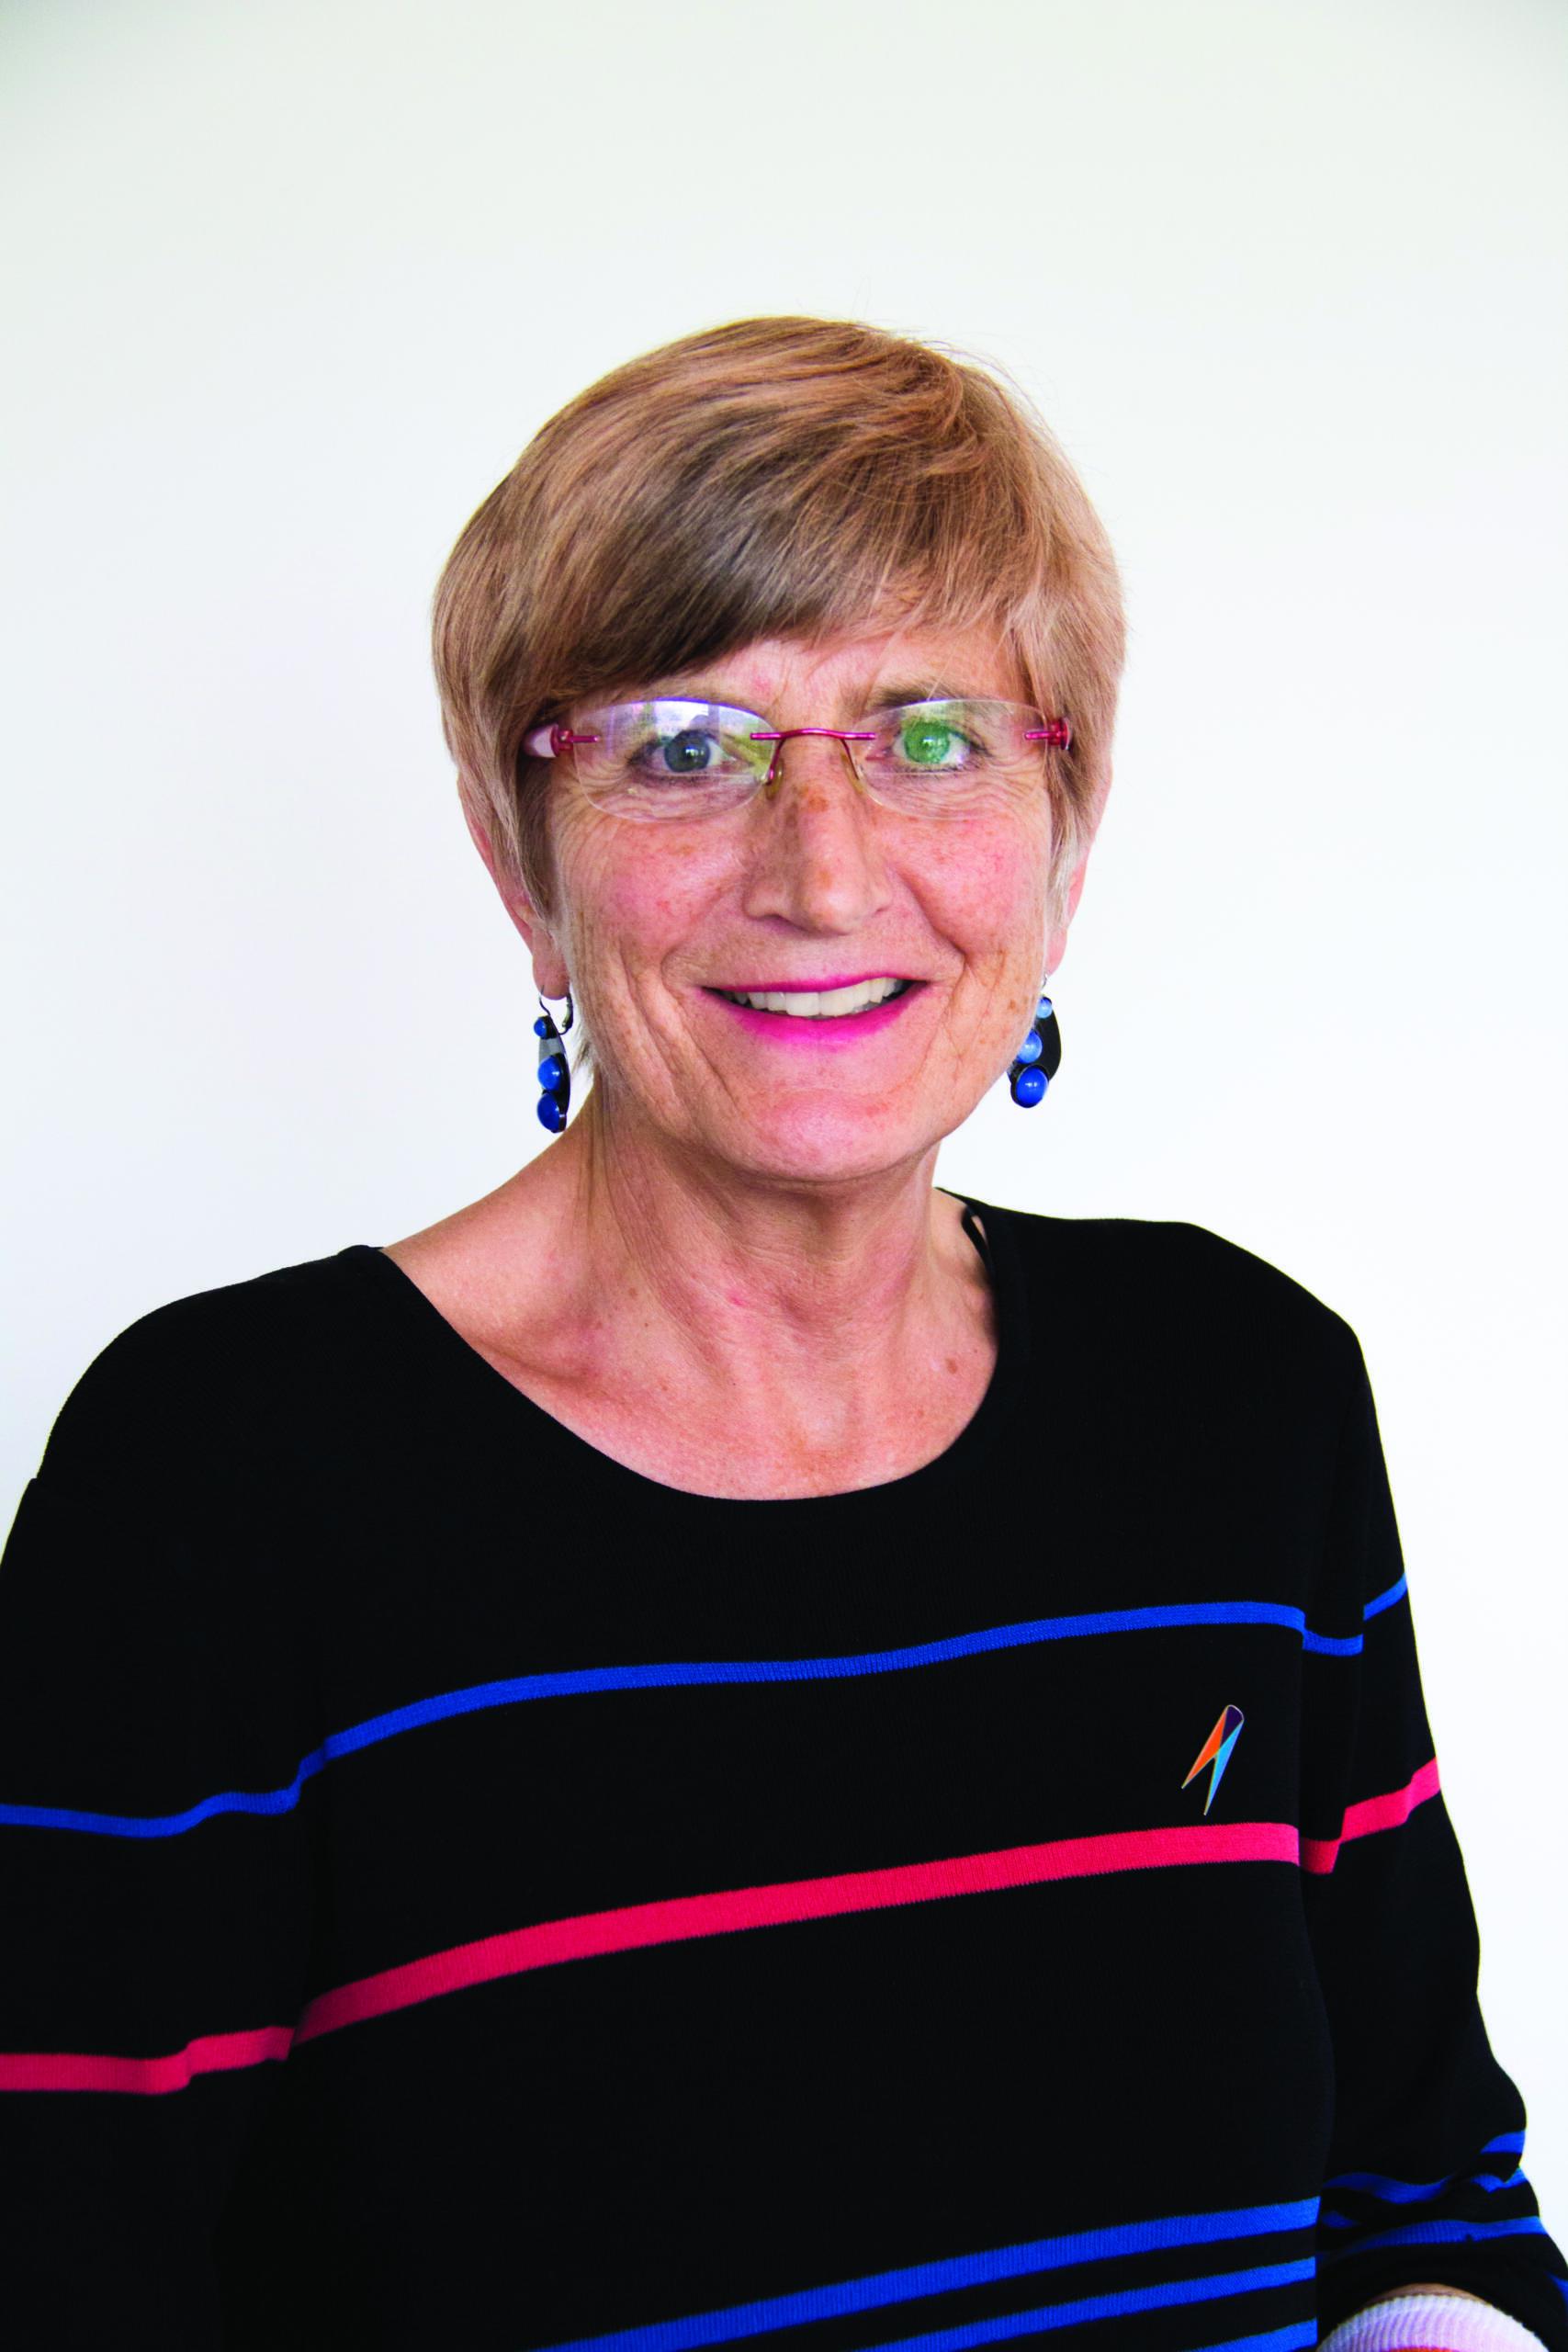 Caroline van den Brul MBE